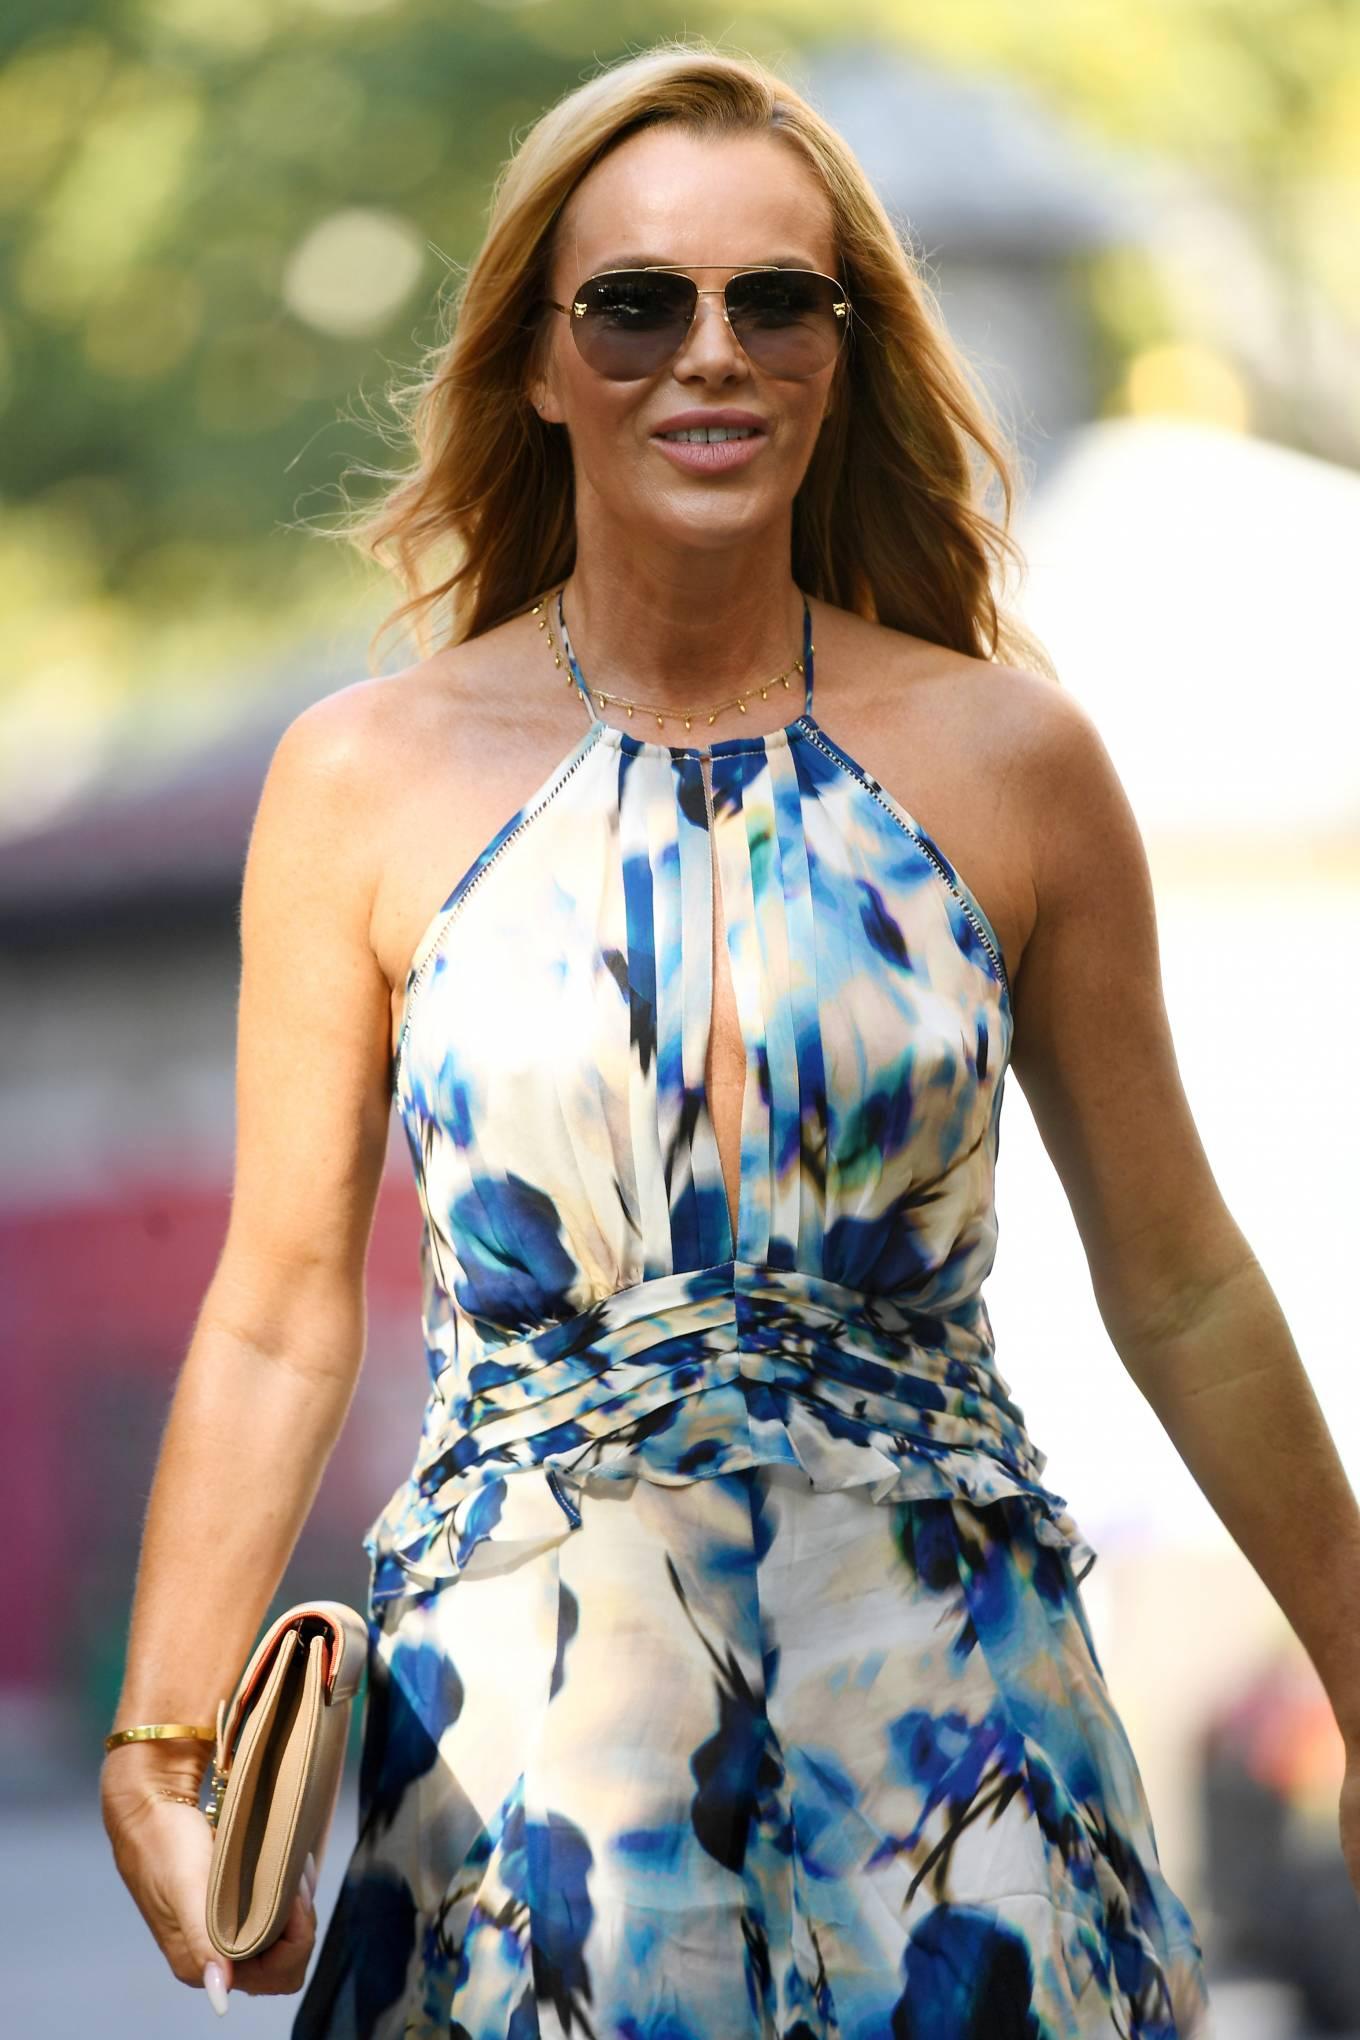 Amanda Holden 2021 : Amanda Holden – In a sky blue summer dress is seen at Global Radio Studios in London-09